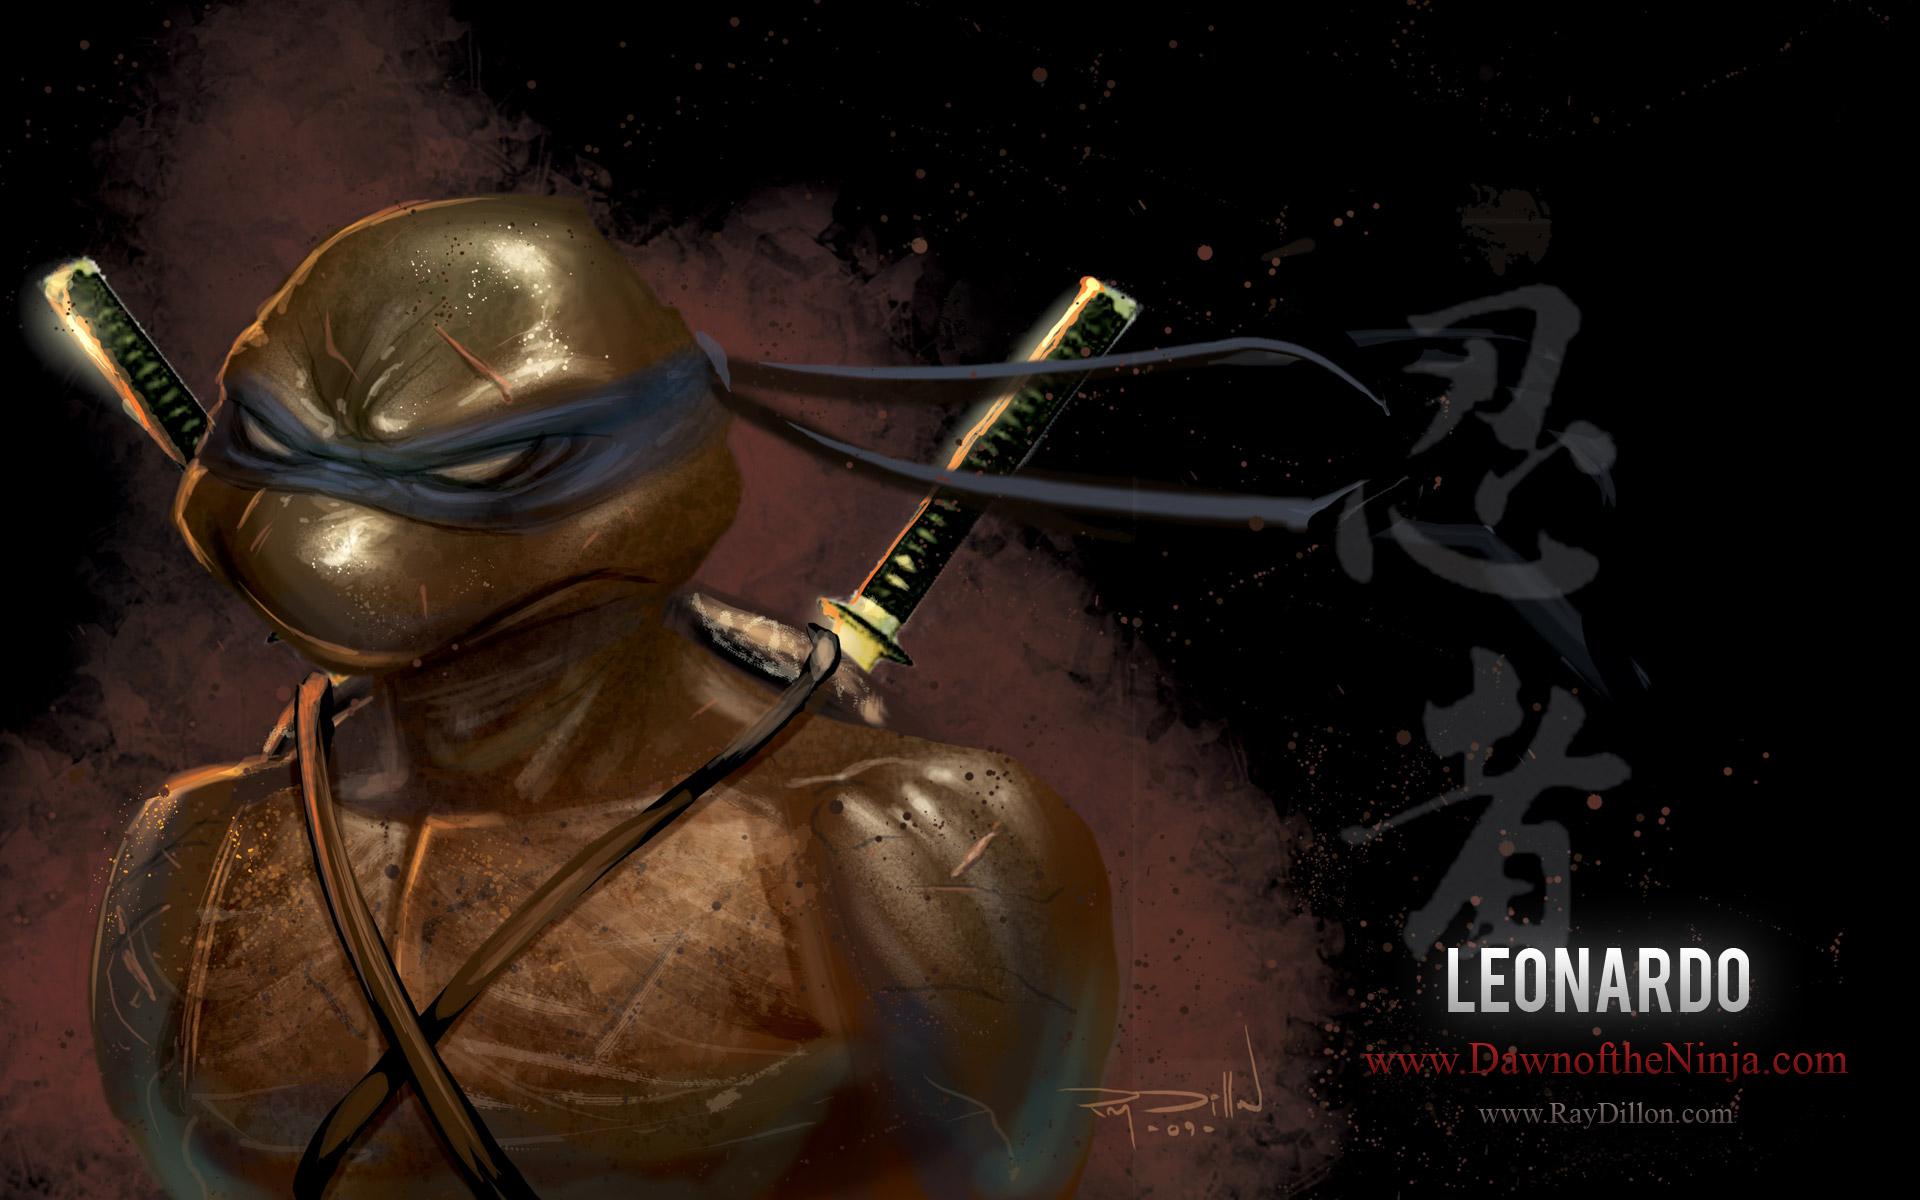 3d Wallpaper For Tv Unit Teenage Mutant Ninja Turtles Leonardo Drawing Hd Wallpaper